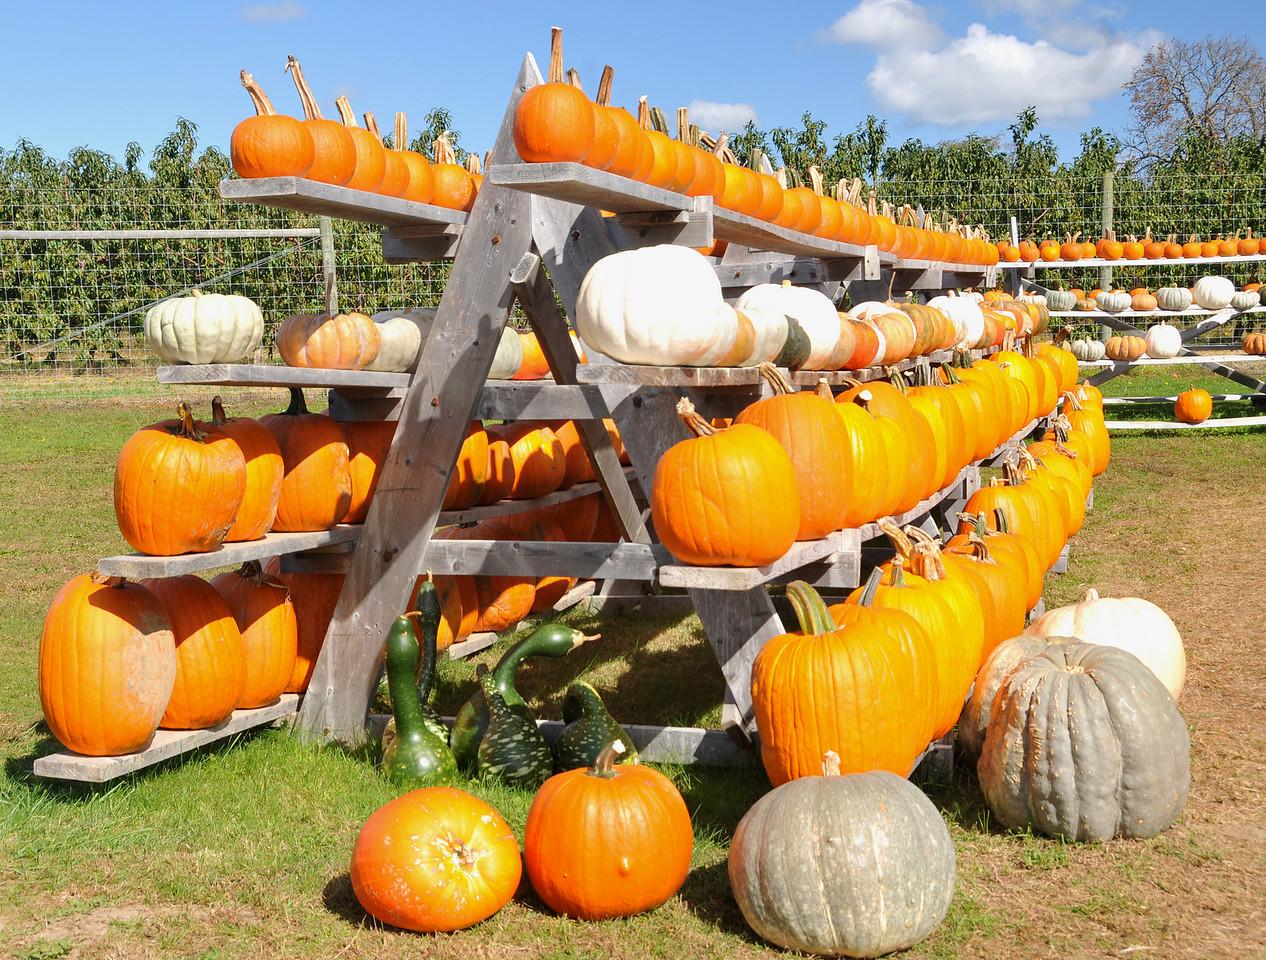 Roadside pumpkin stand, East End, Long Island